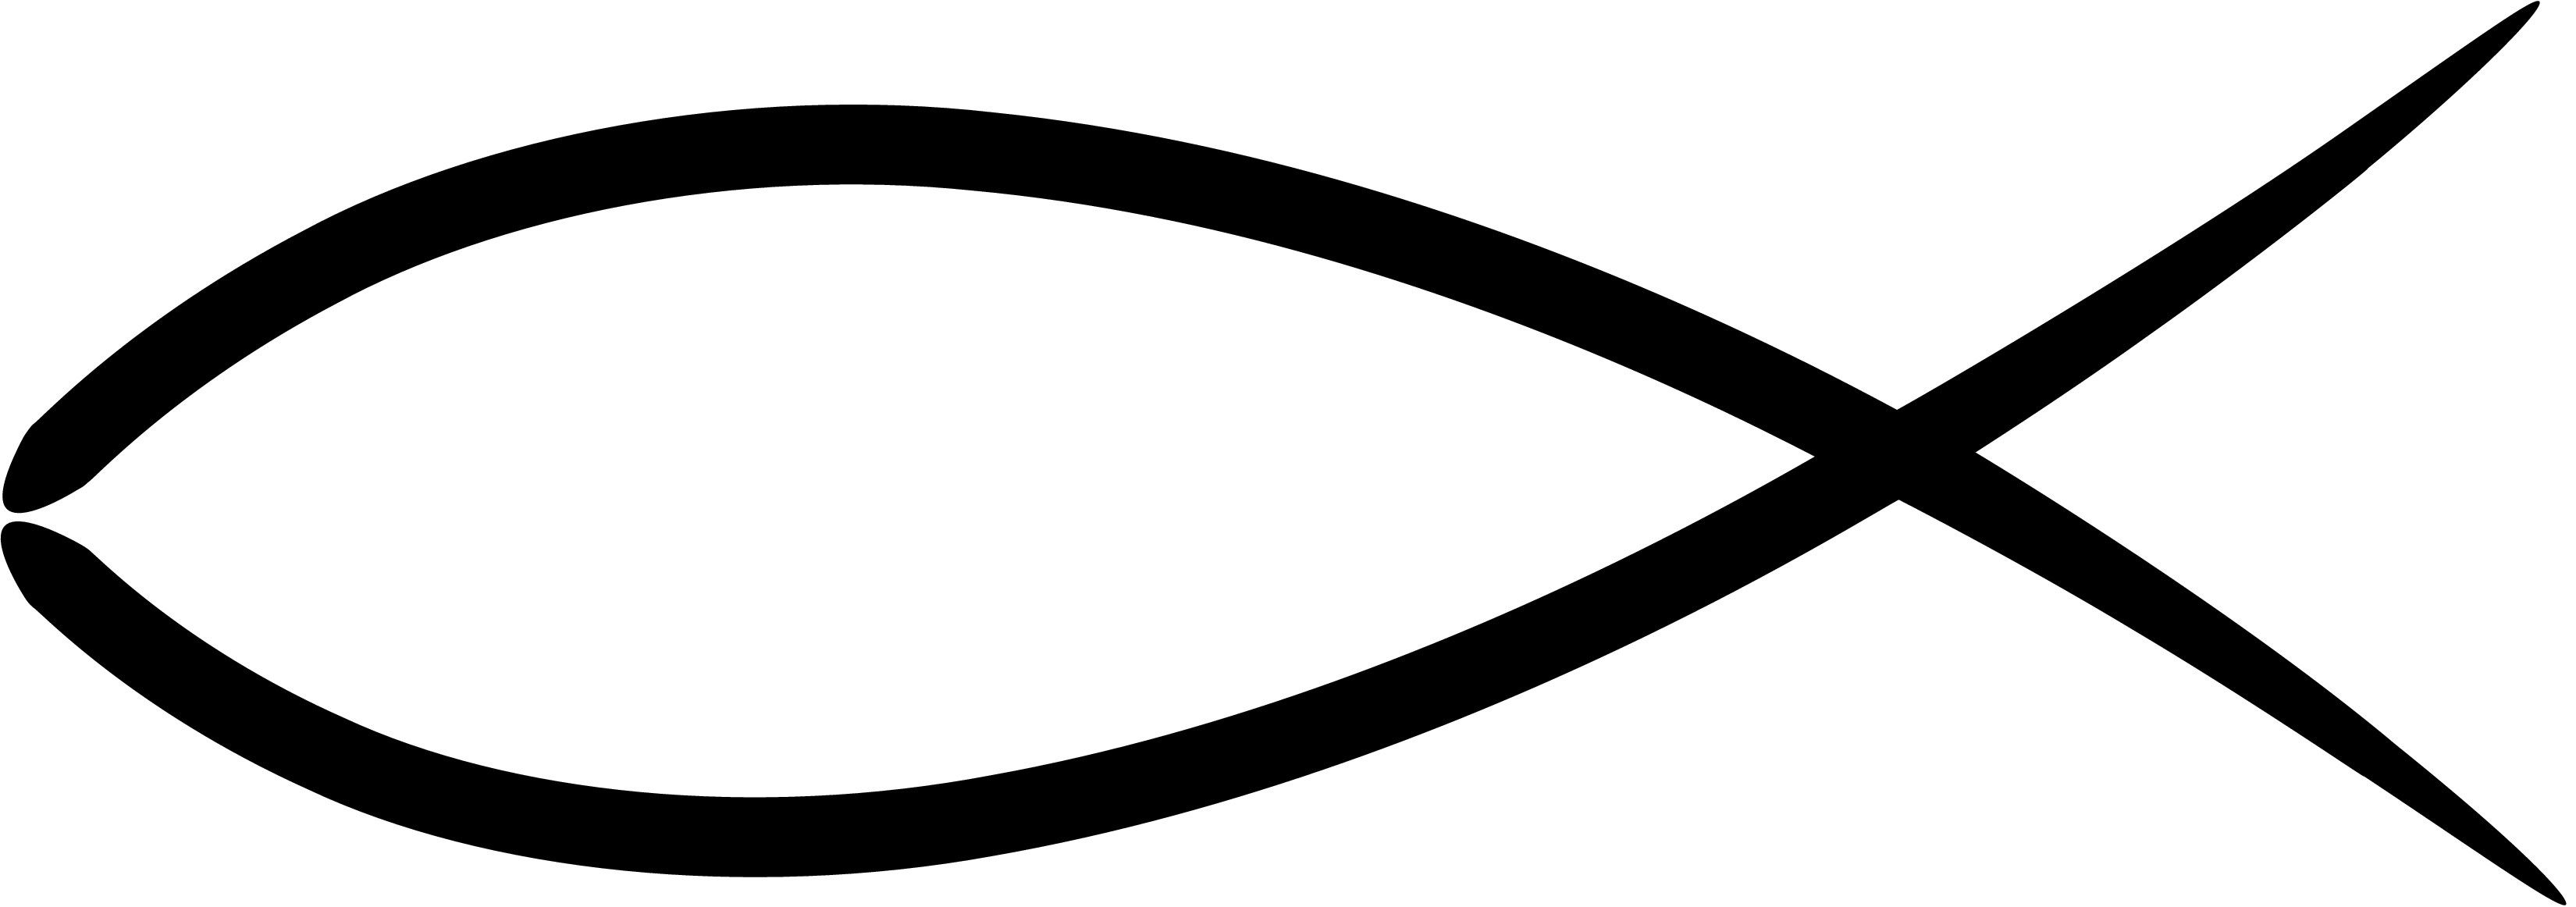 Religion Symbol Clipart Look At Religion Symbol Clip Art Images